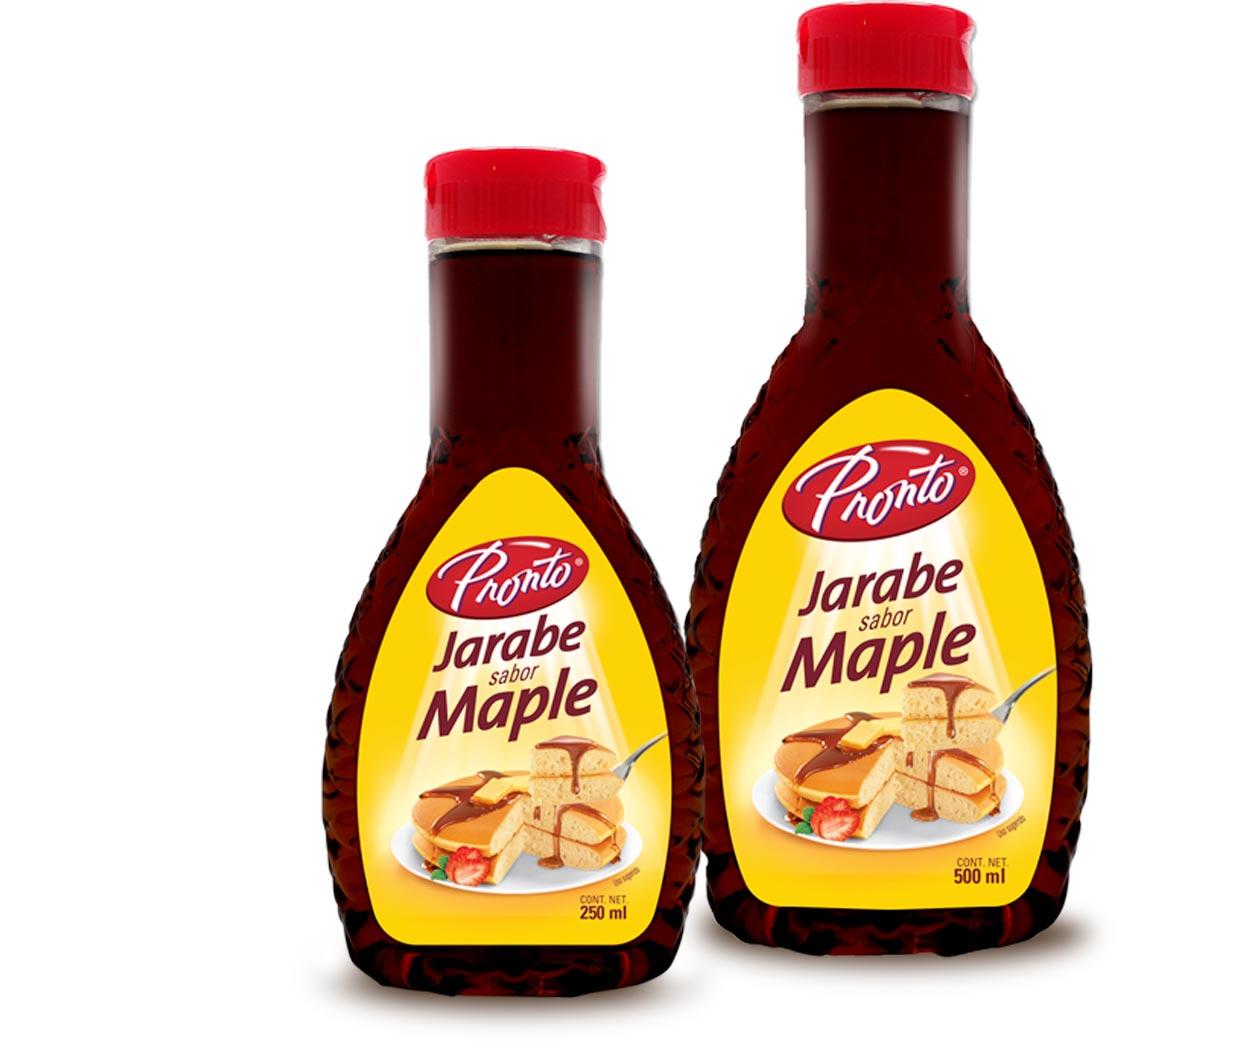 Jarabe sabor maple Pronto